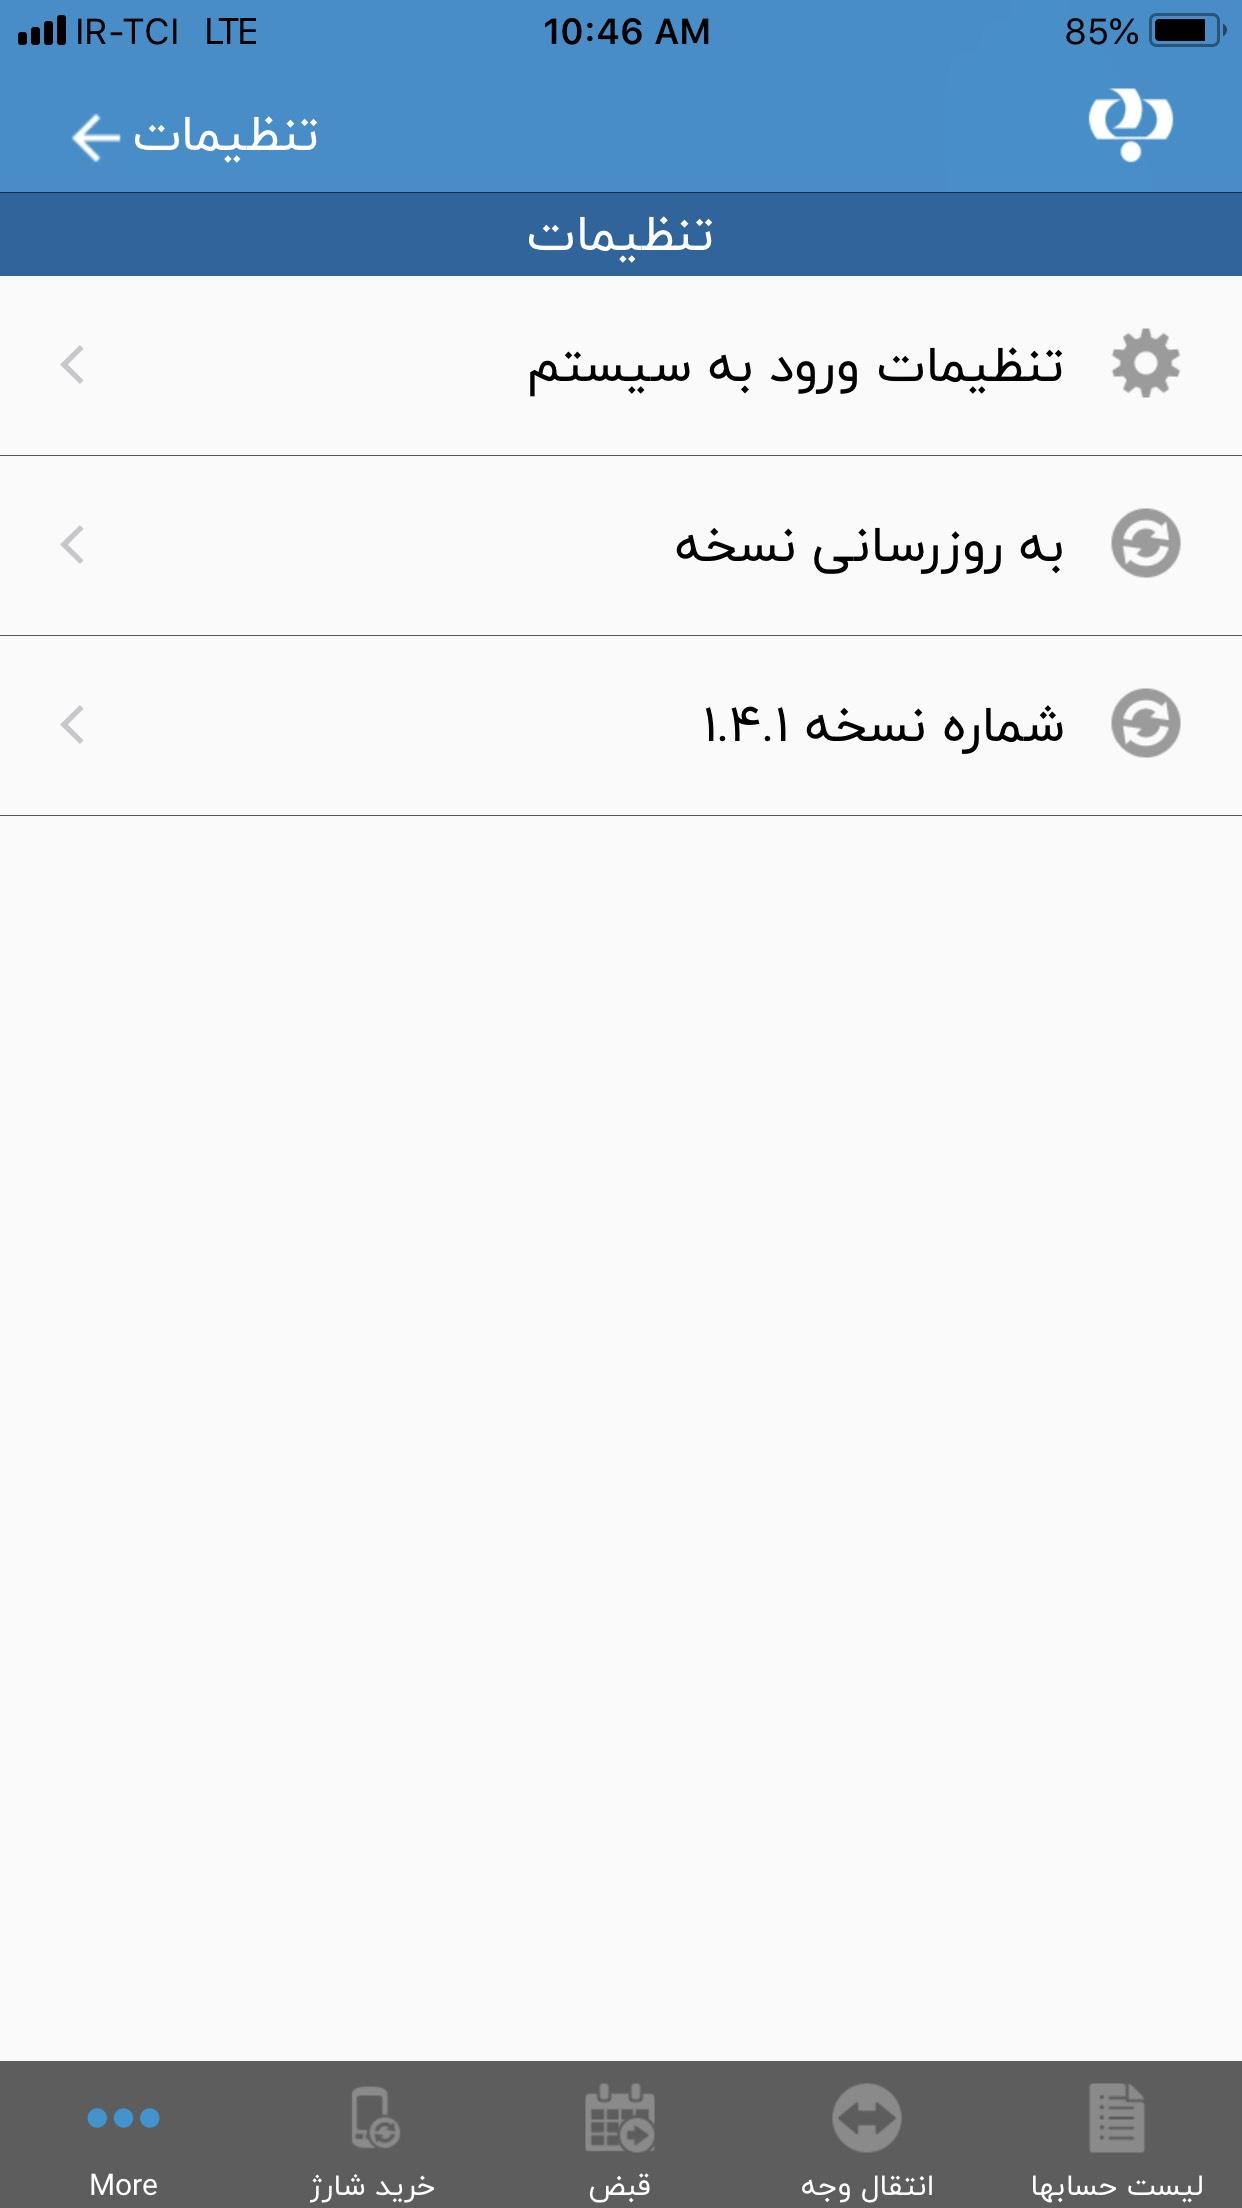 موبایل بانک رفاه | Refah Mobile Bank